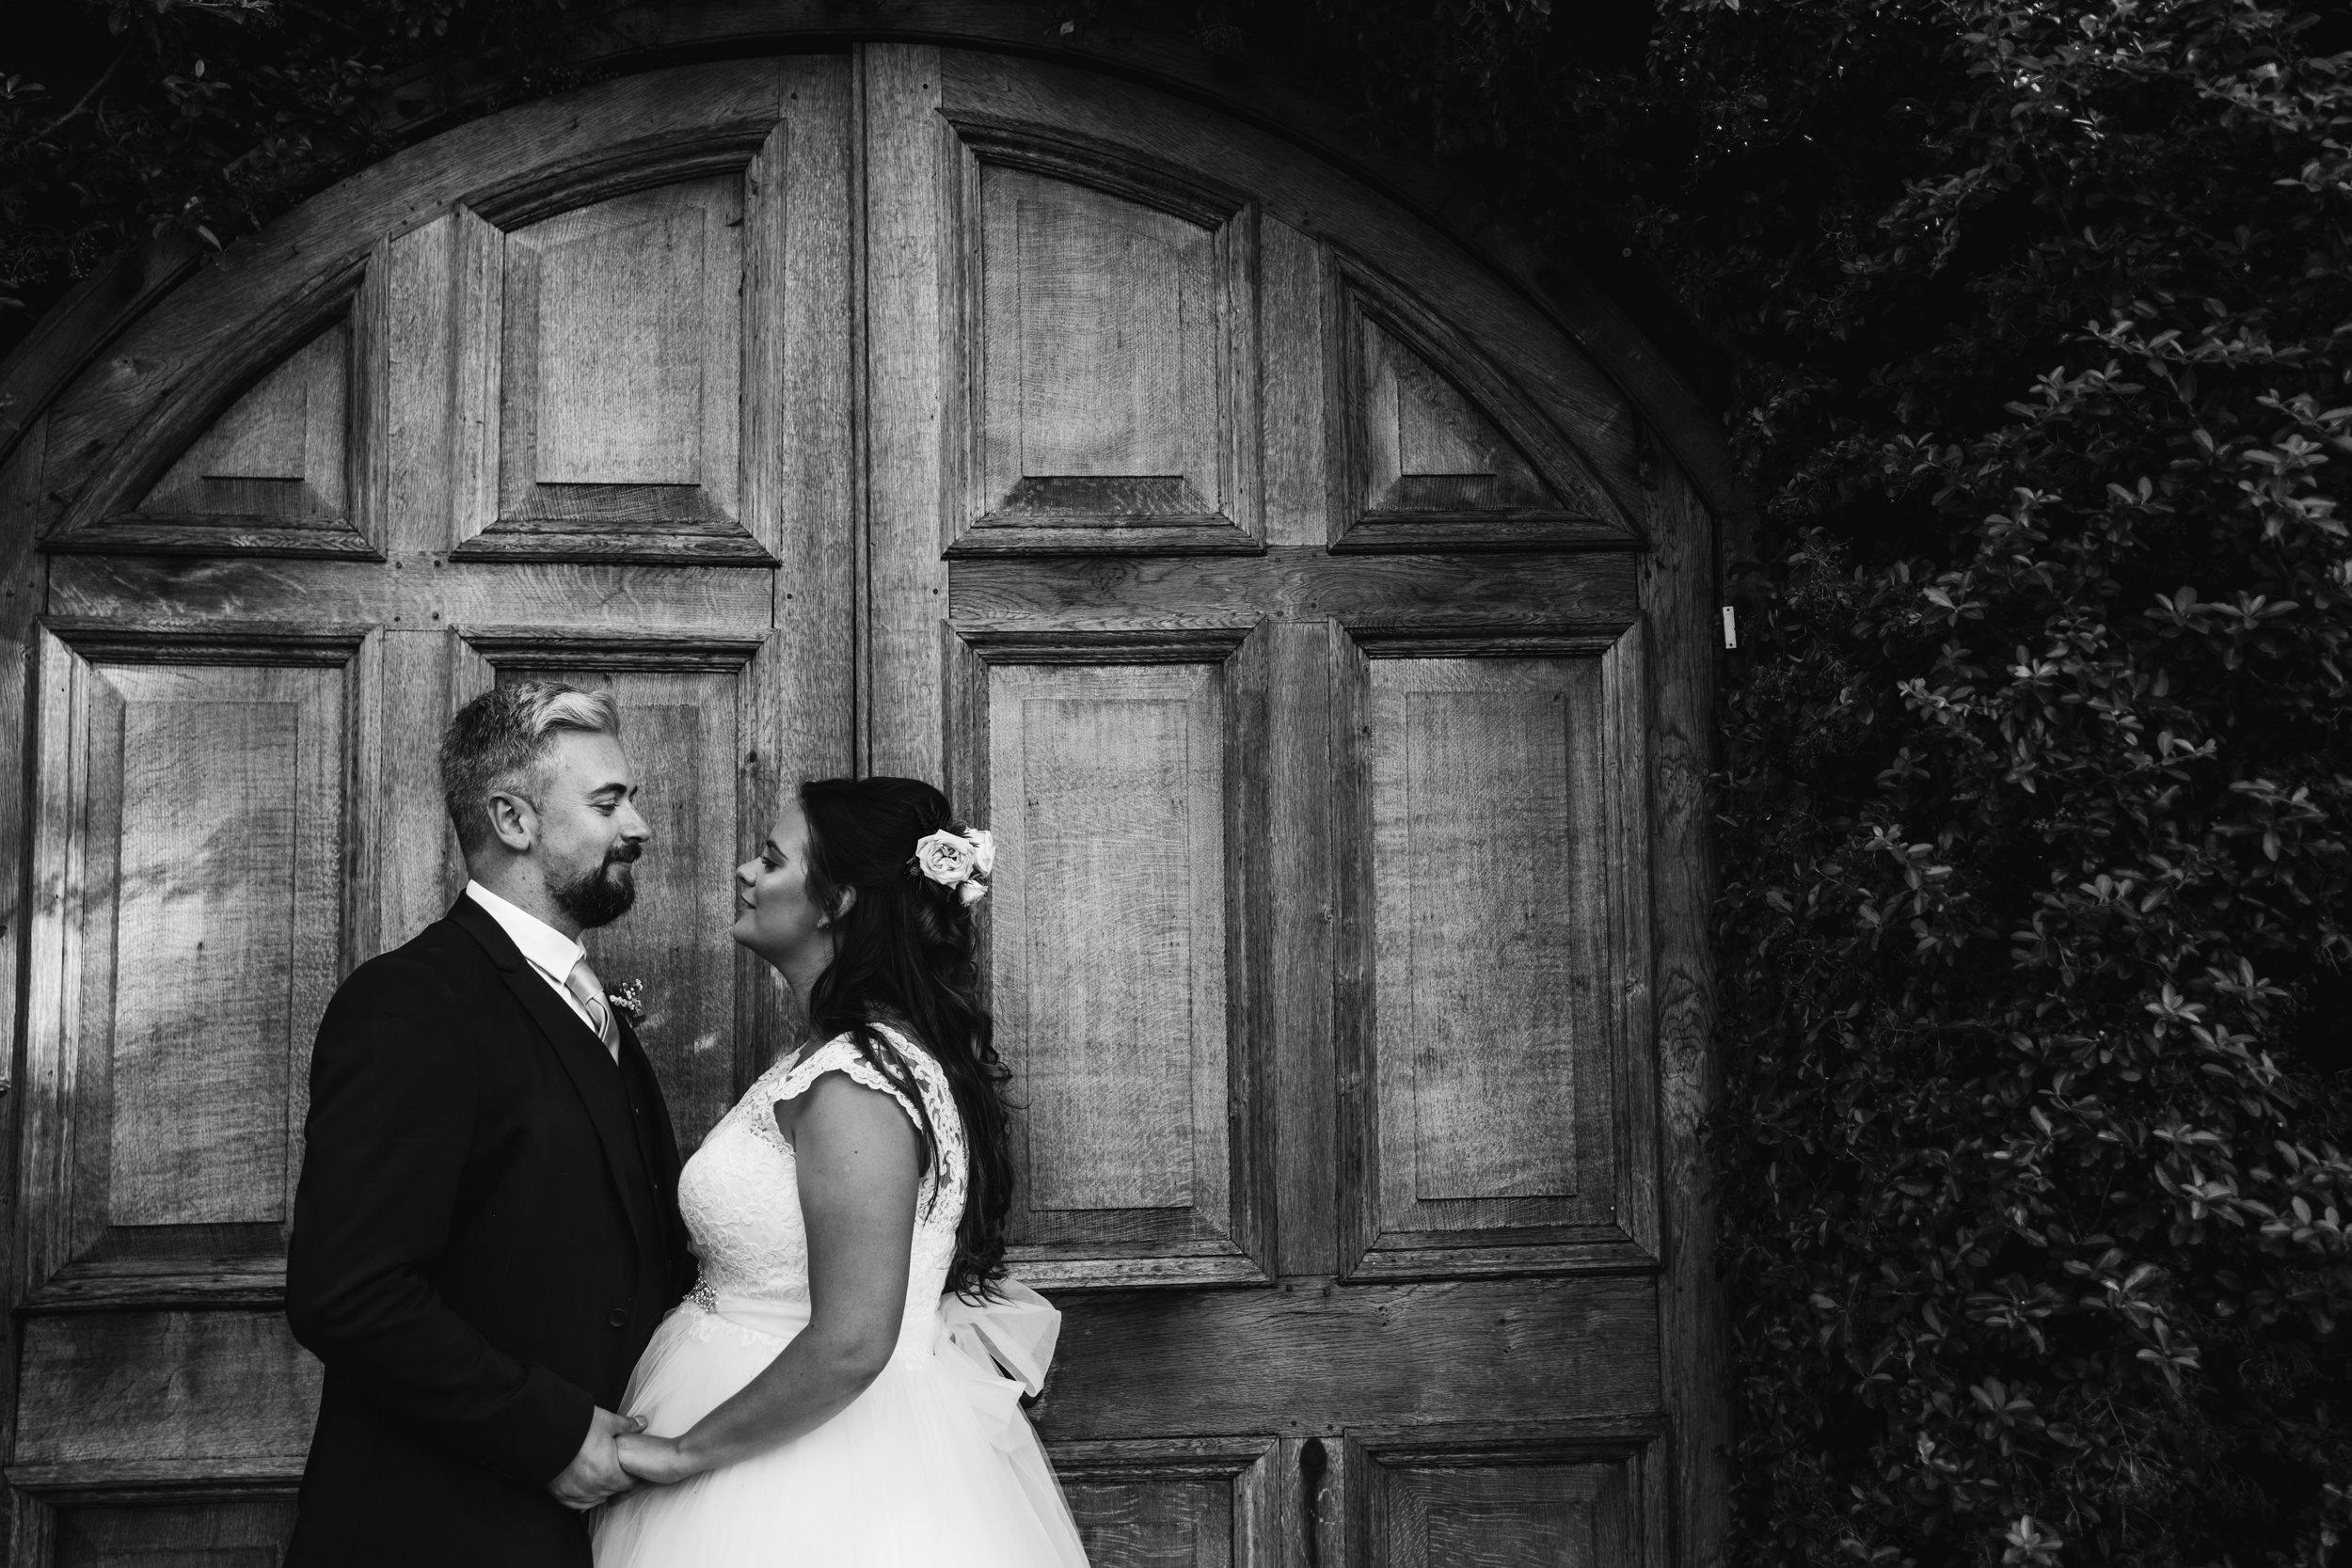 kent-wedding-photographer-109470.jpg